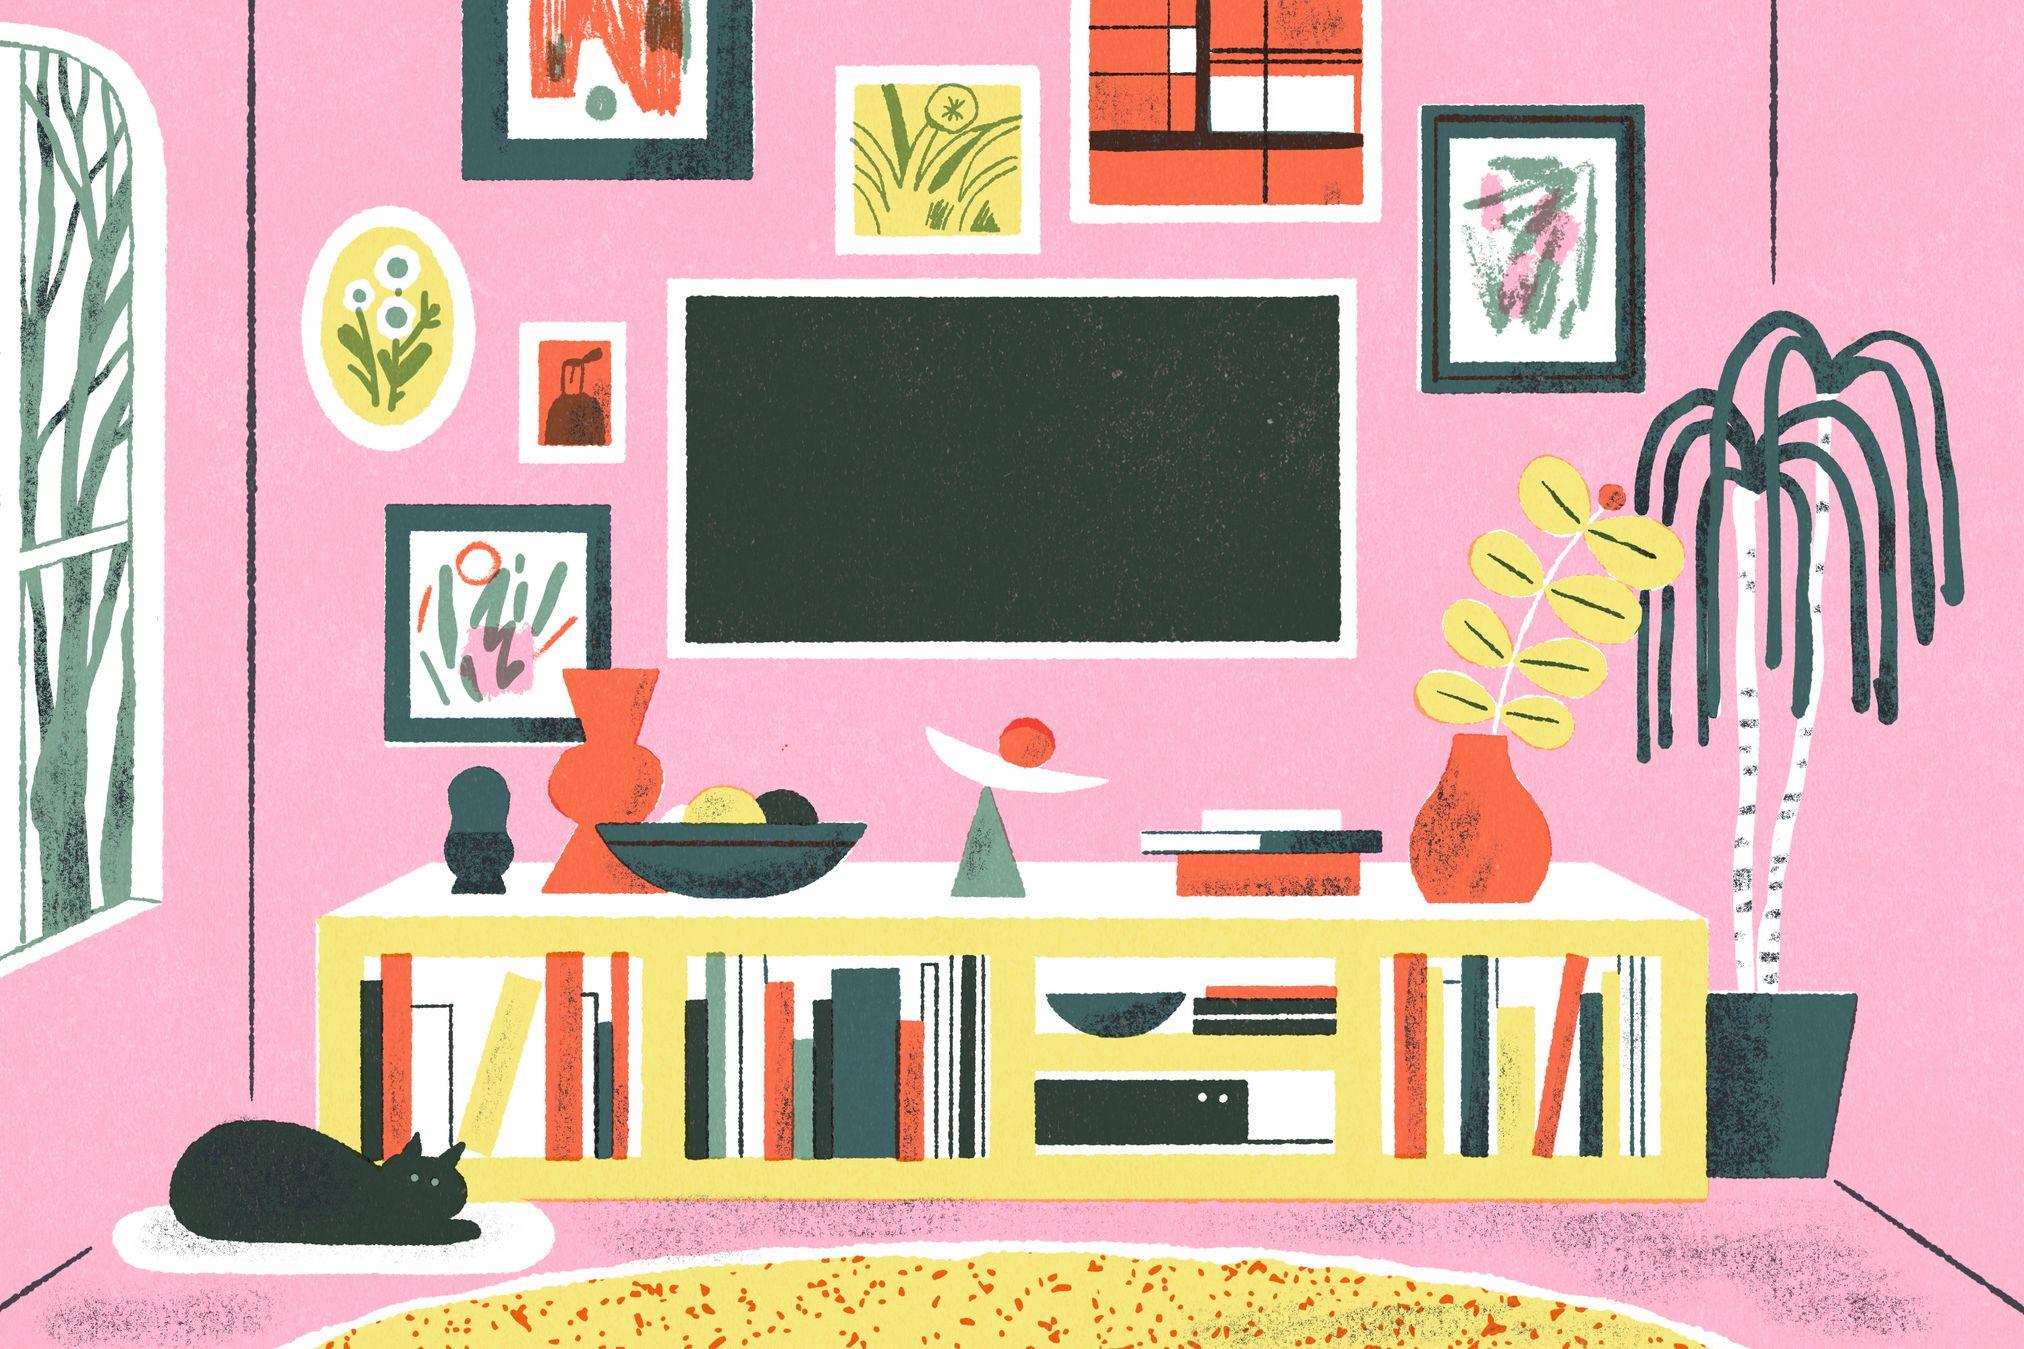 garance-illustration-Malota-Wall-Mount-Your-Television_web